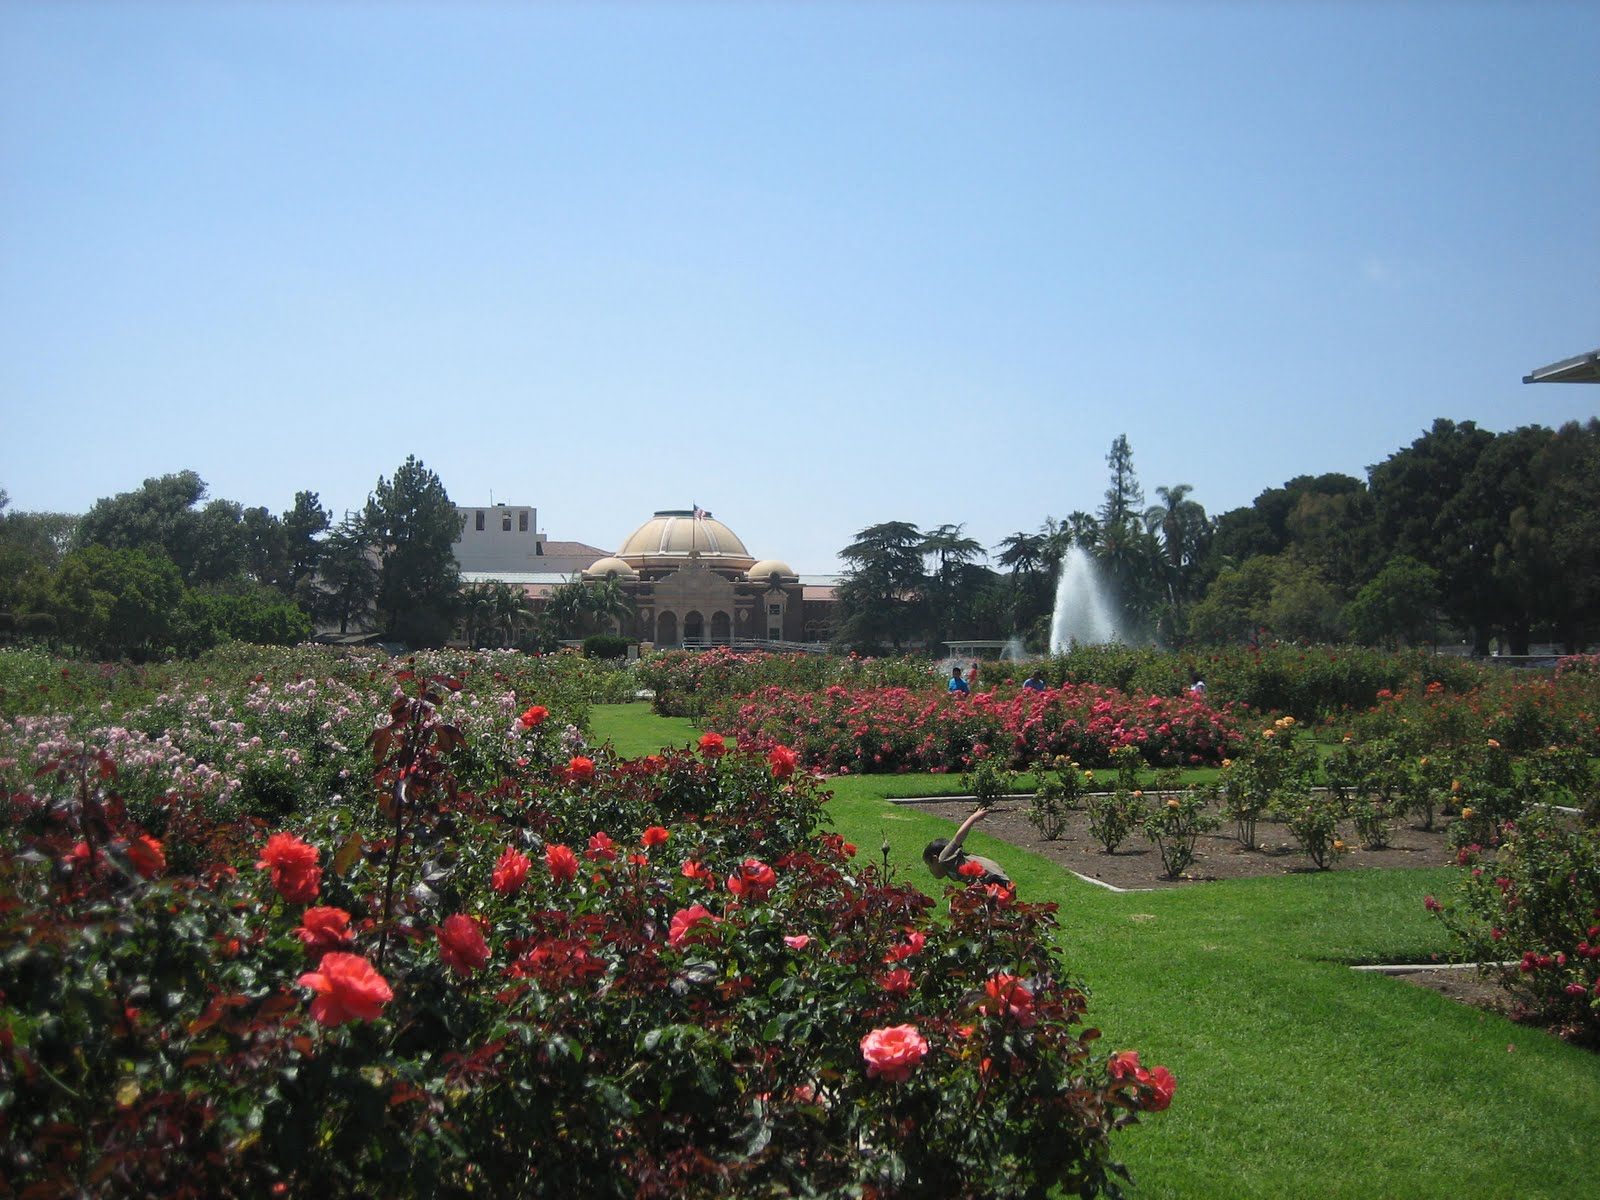 Roses In Garden: L.A. Places: Exposition Park Rose Garden